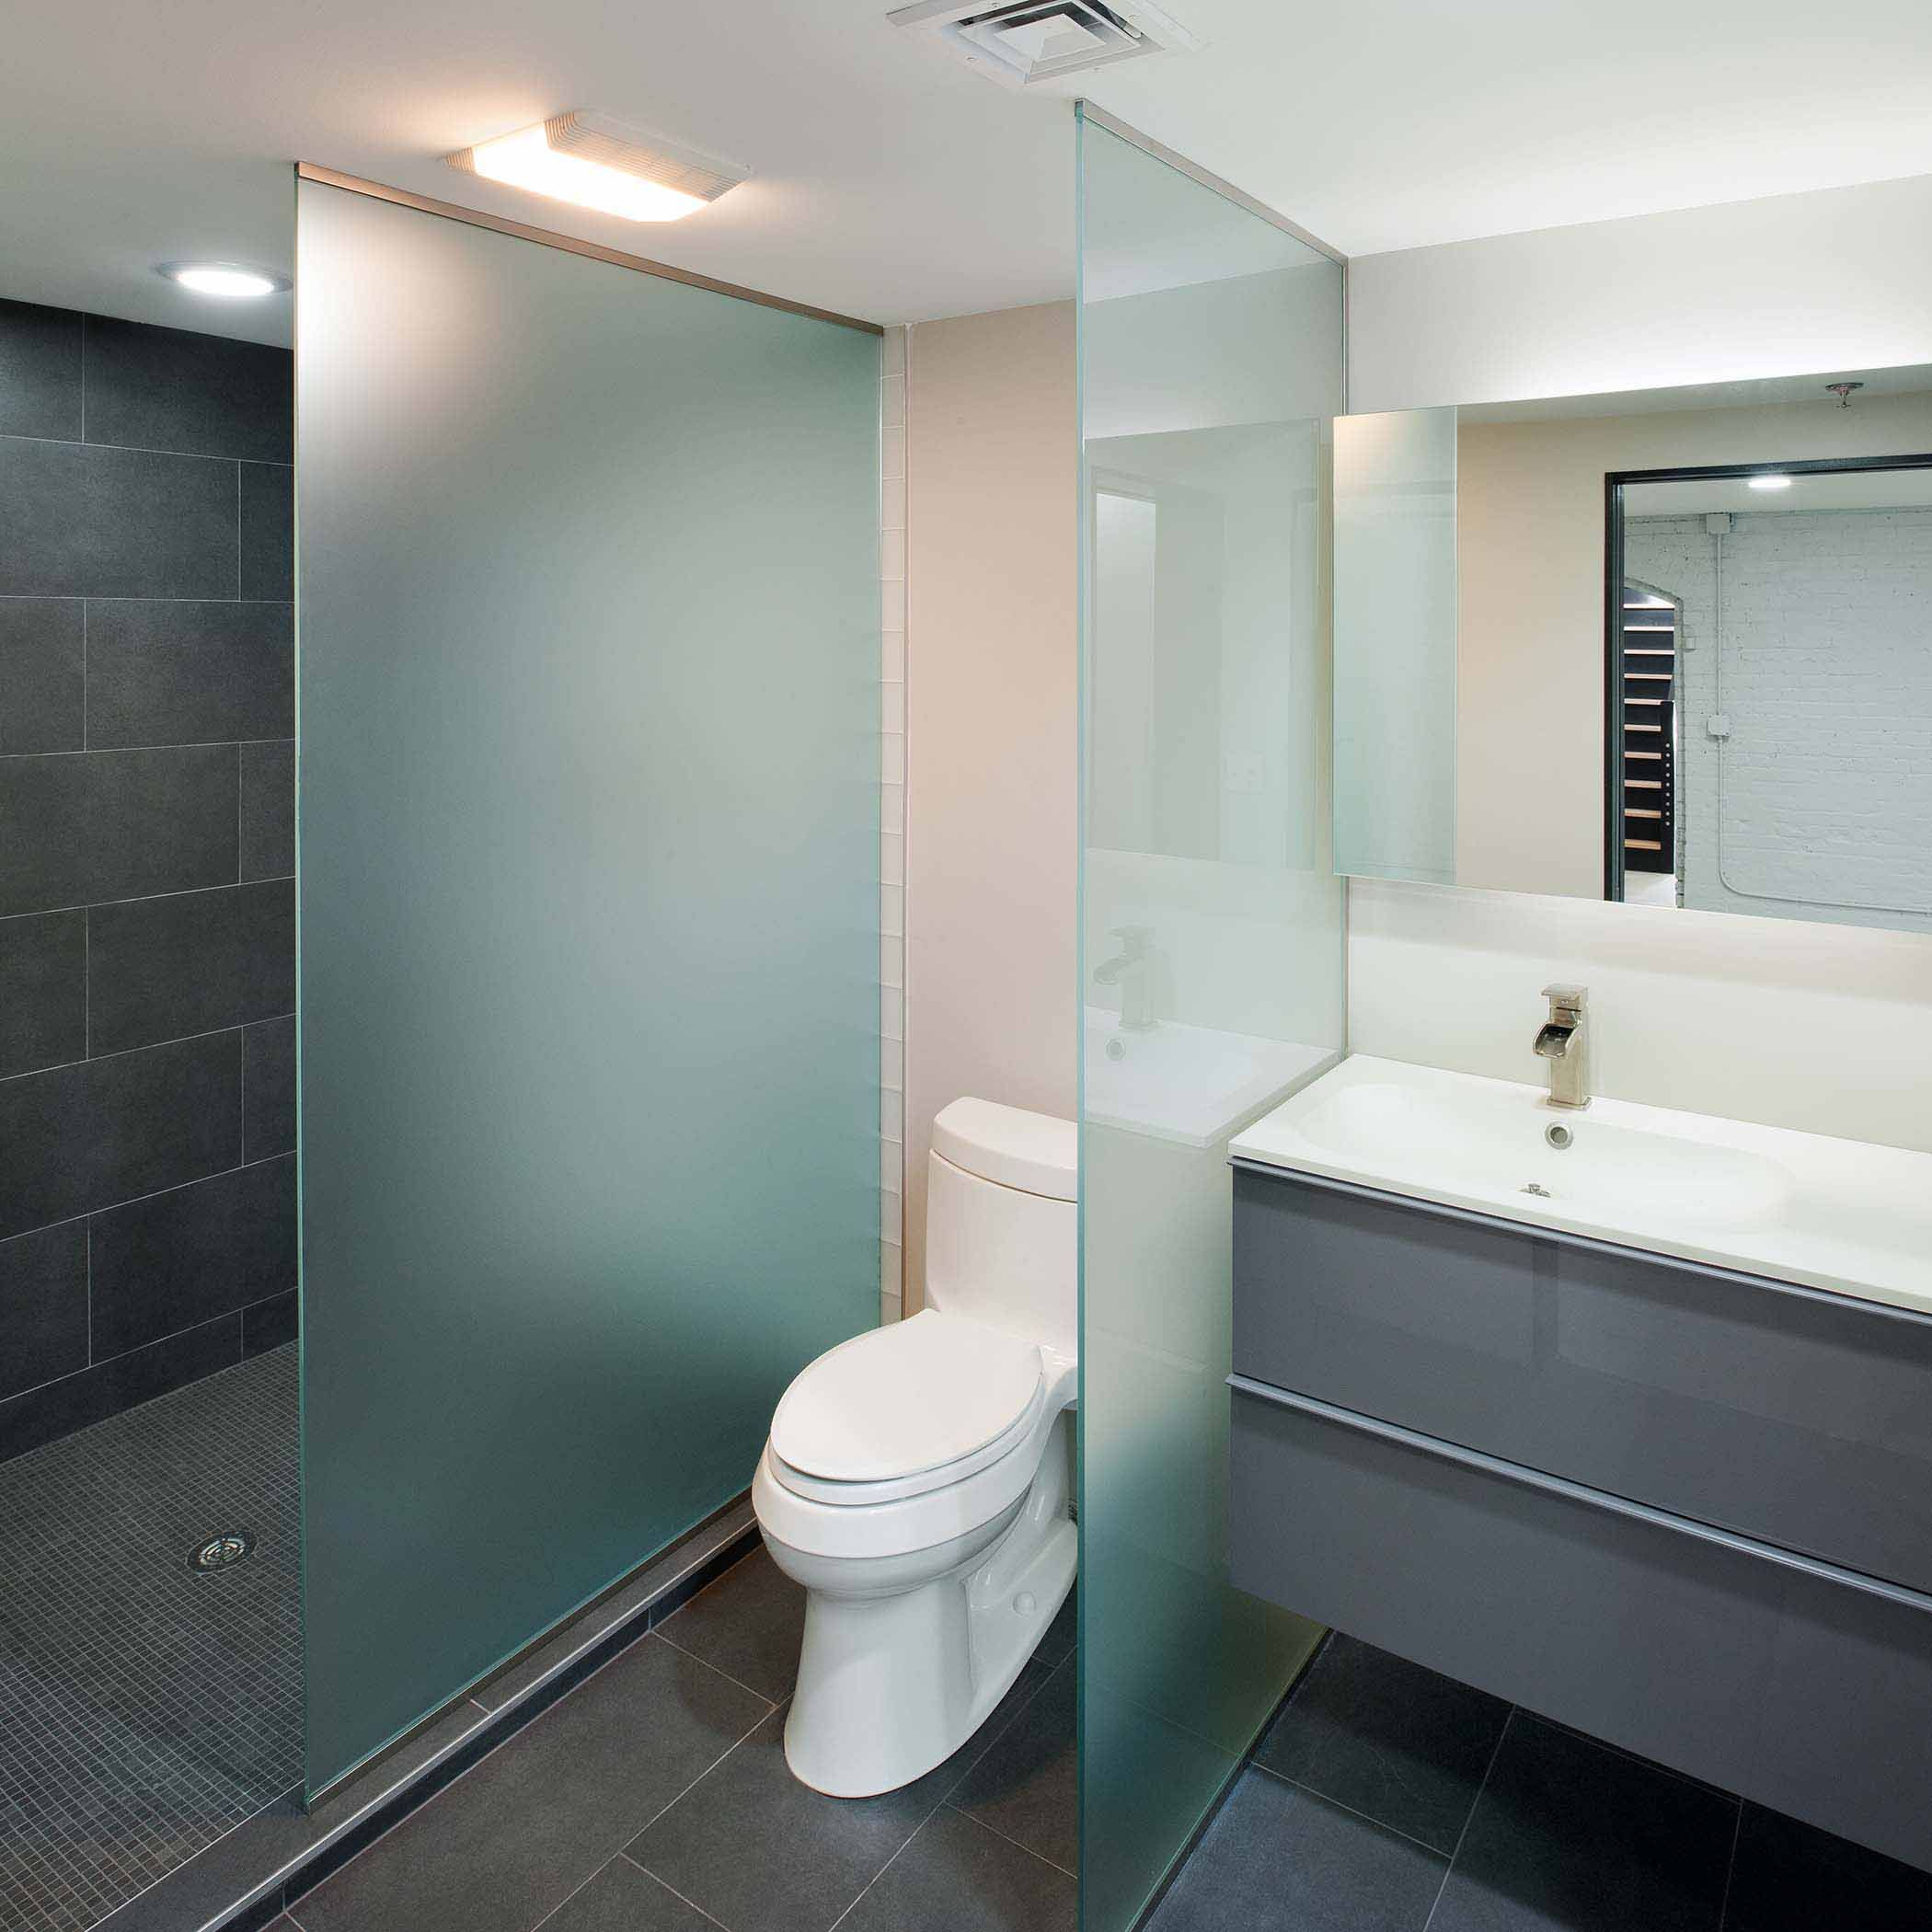 Boiler Room Kelly Taylor Interior Design